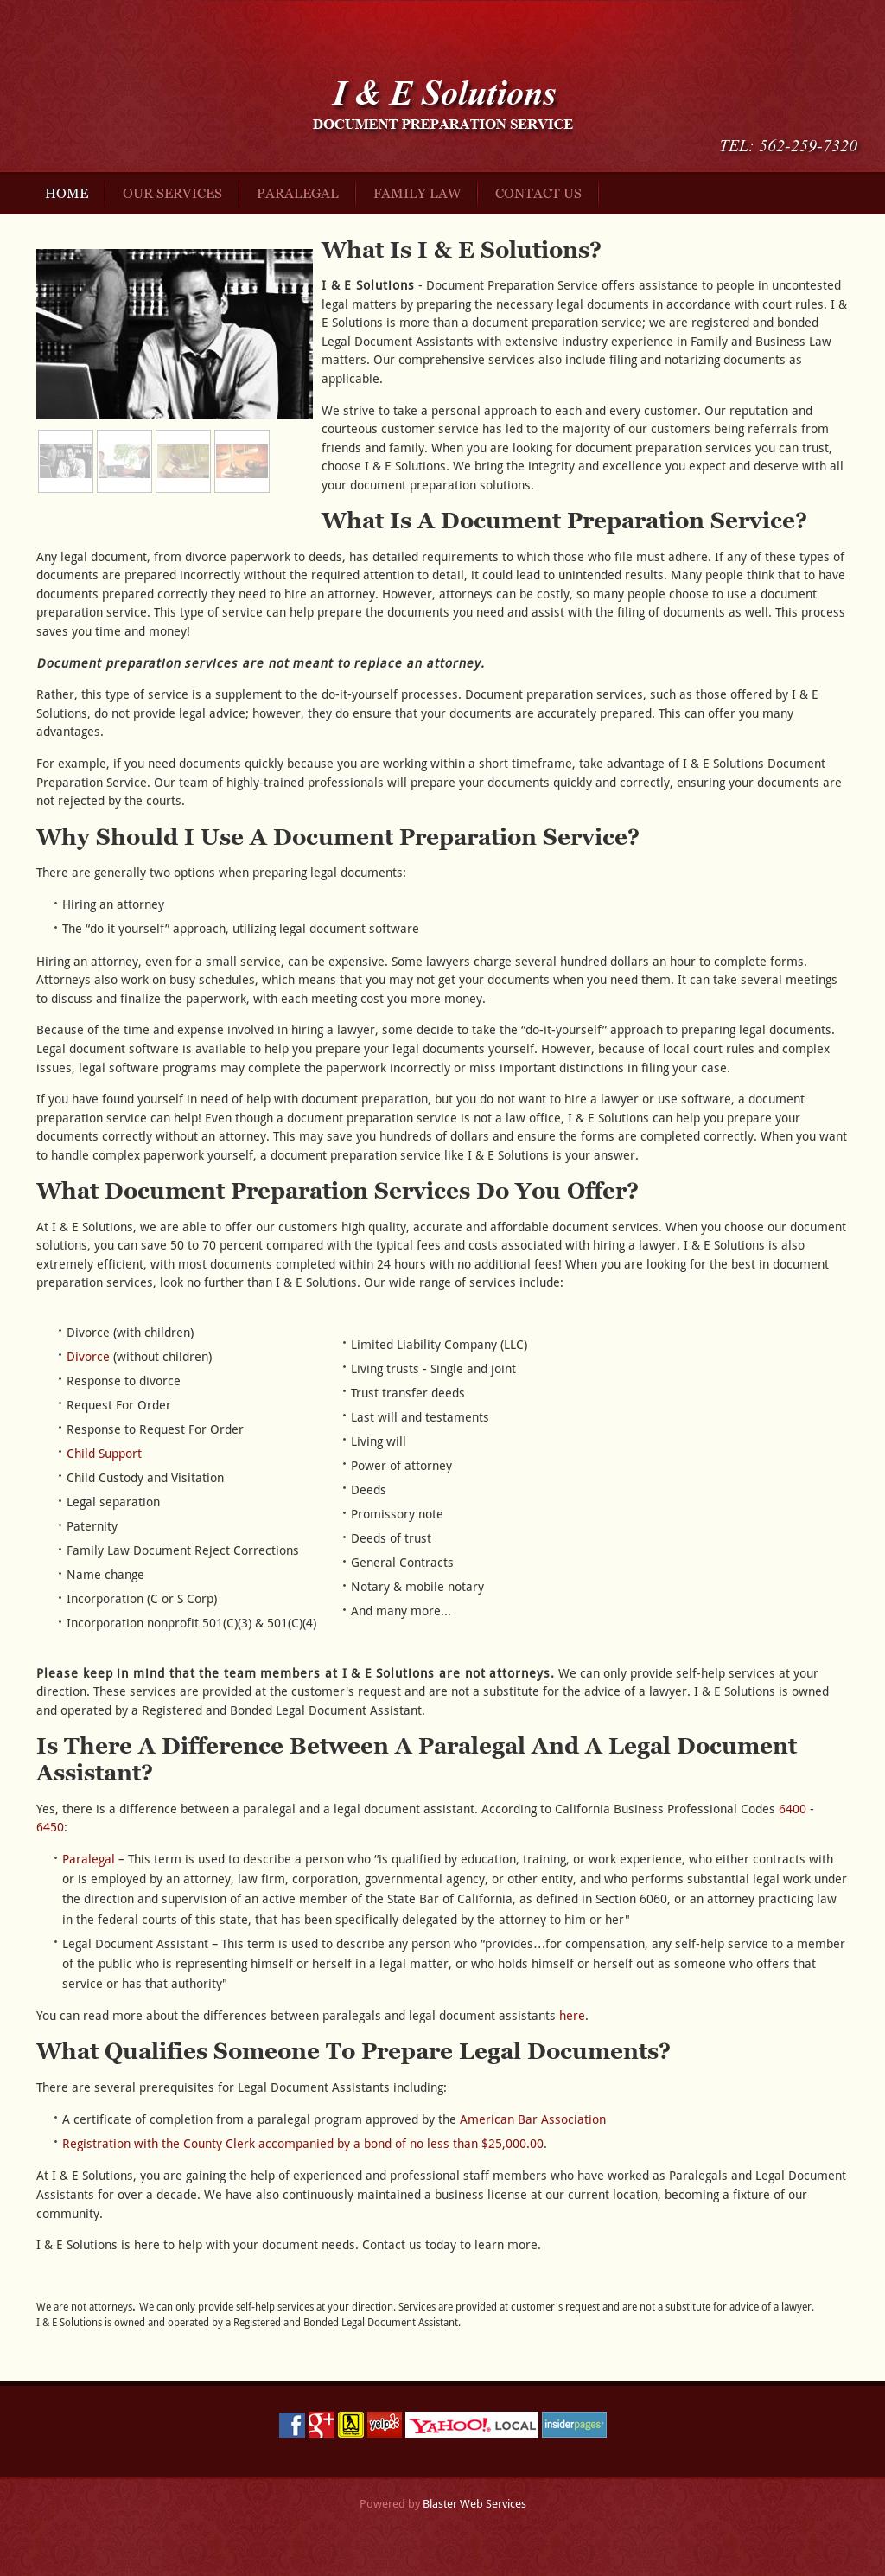 I E Solutions Document Preparation Service Competitors Revenue - Legal document preparation business